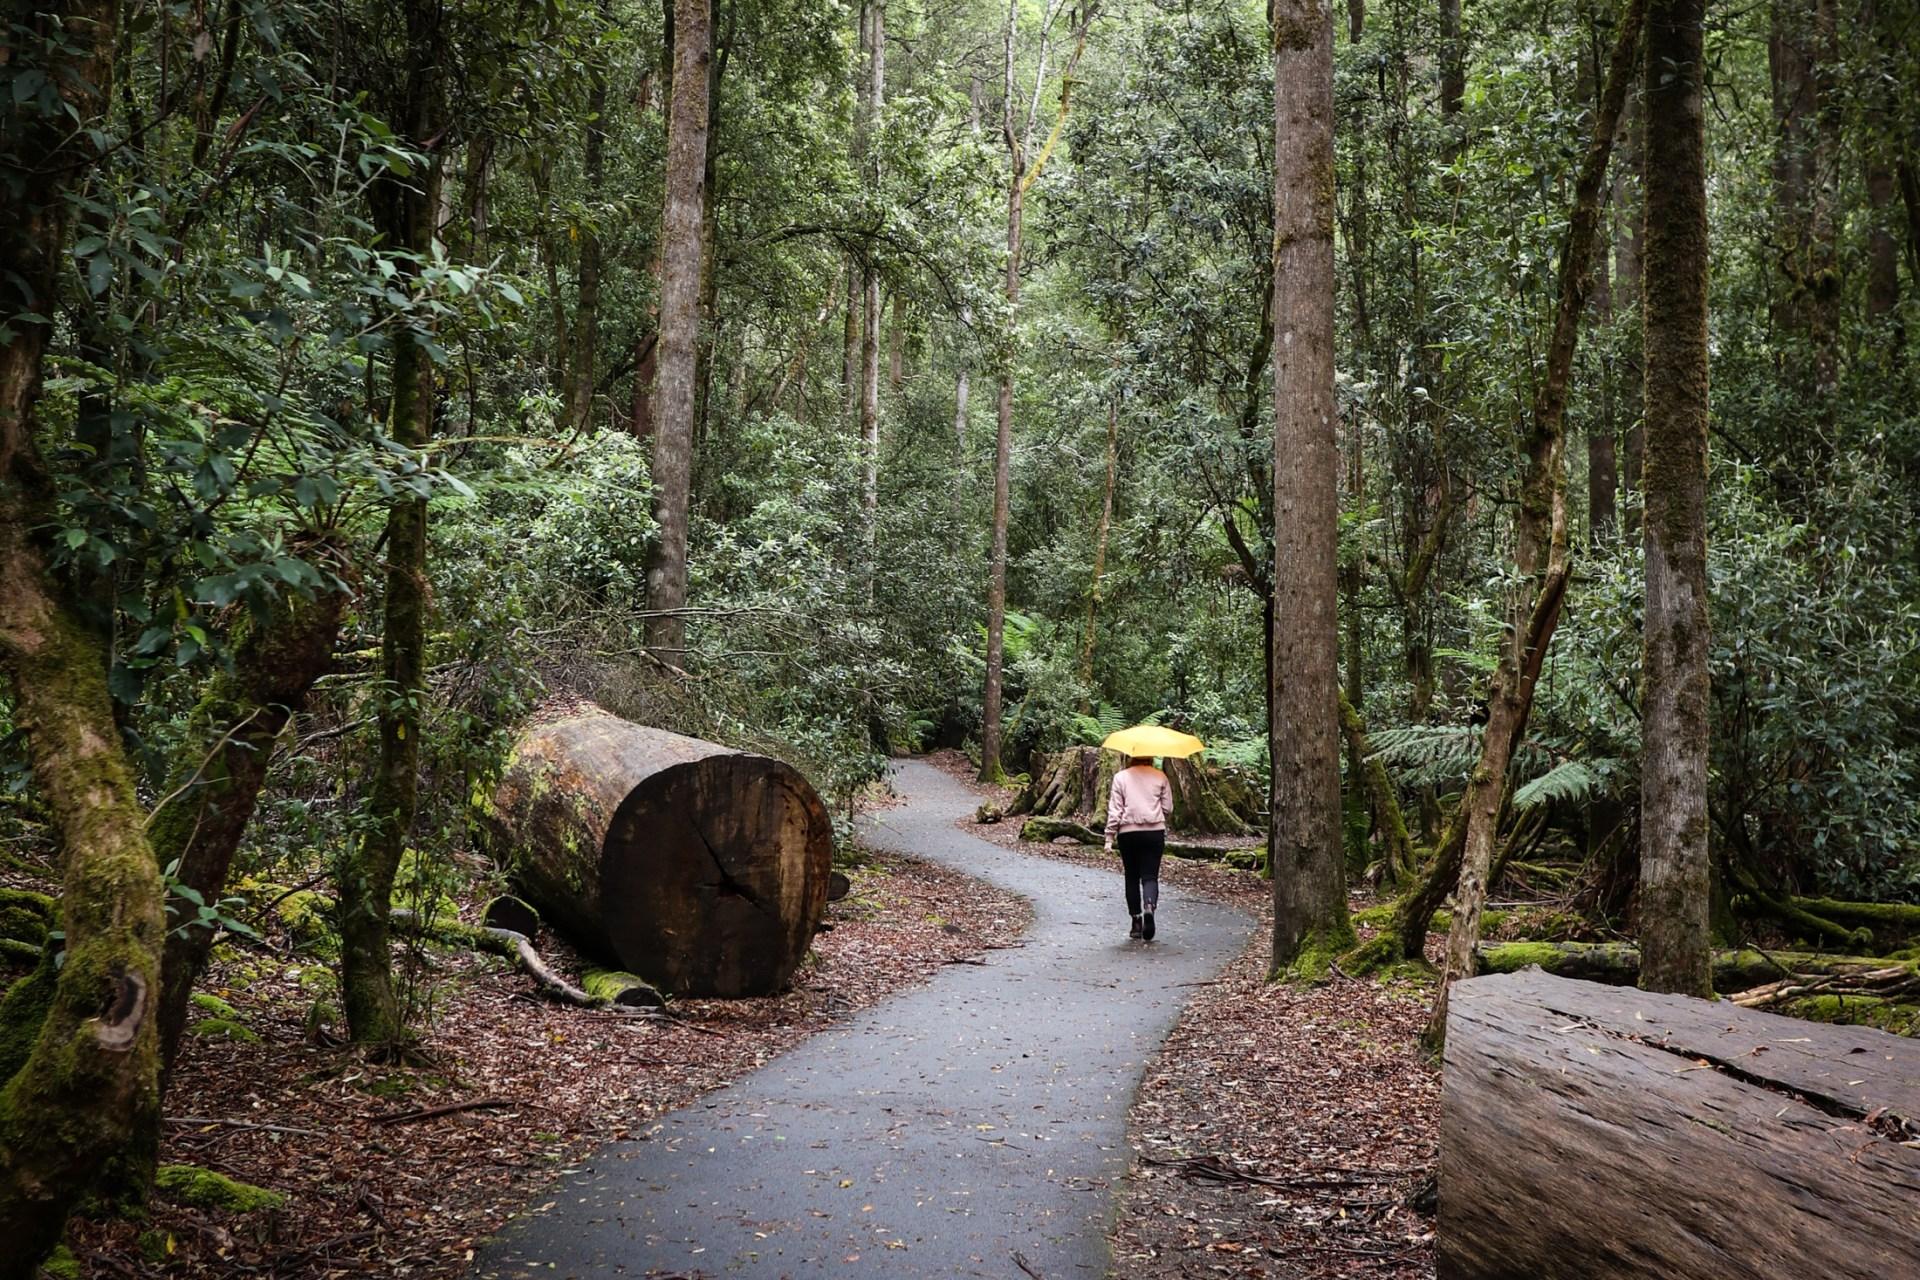 Russell Falls track at Mt. Field National Park in Tasmania